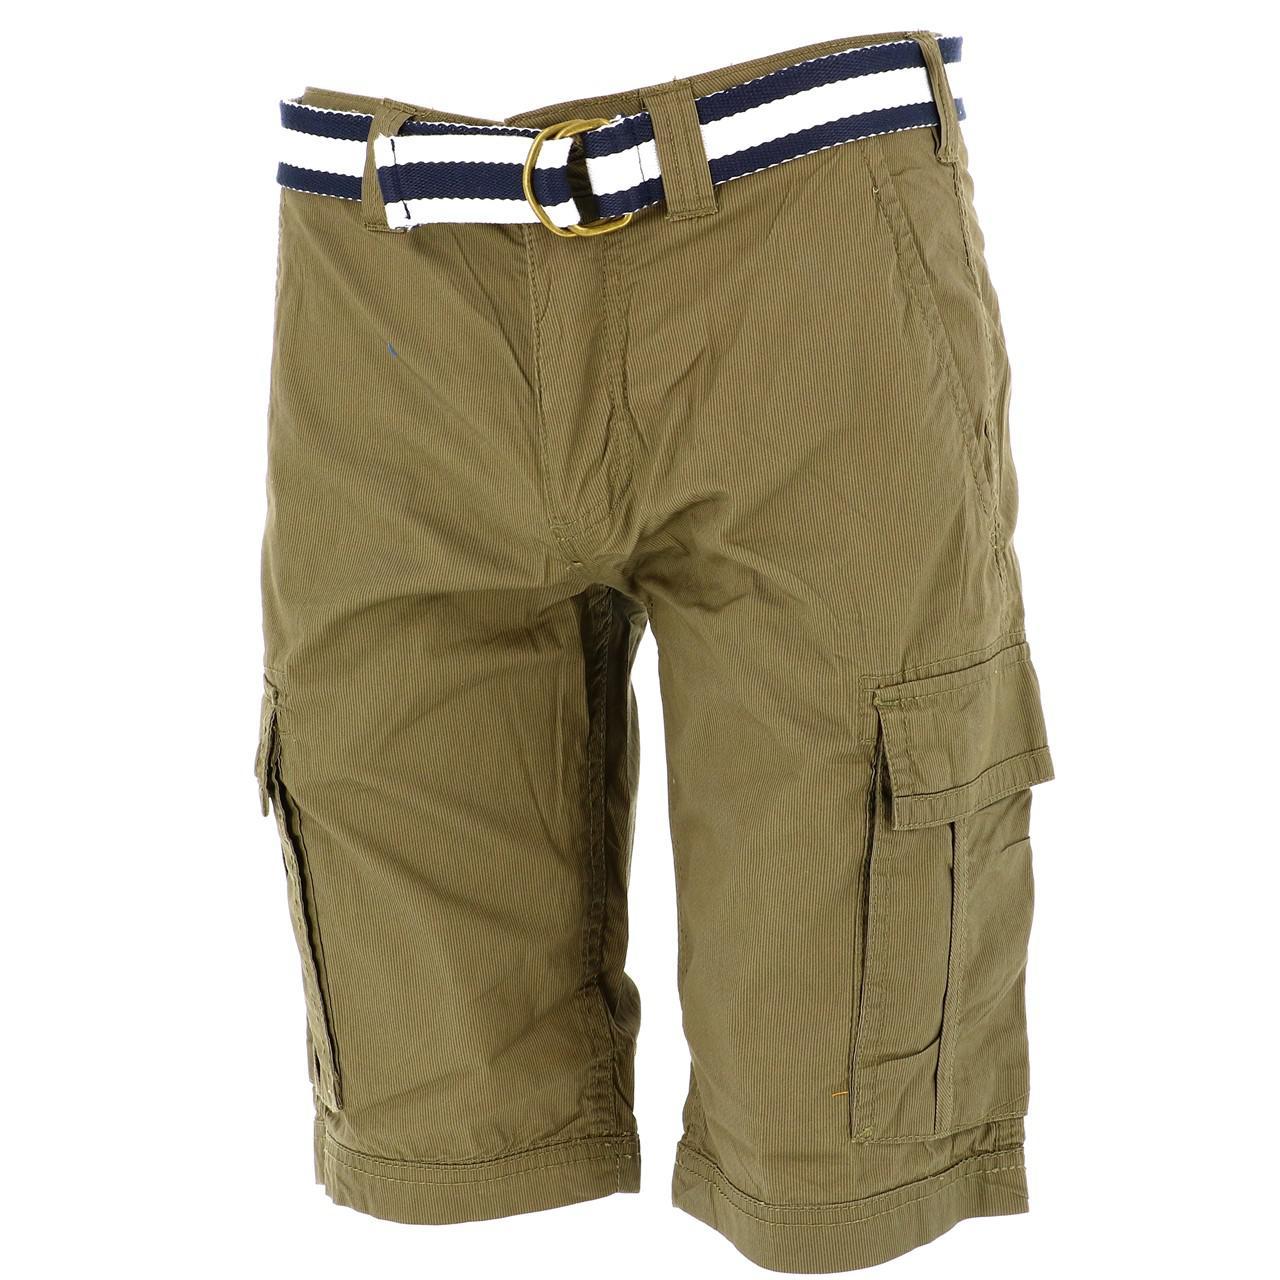 Bermuda-Shorts-Teddy-smith-Sytro-Khaki-Shorts-Jr-Green-18199-New